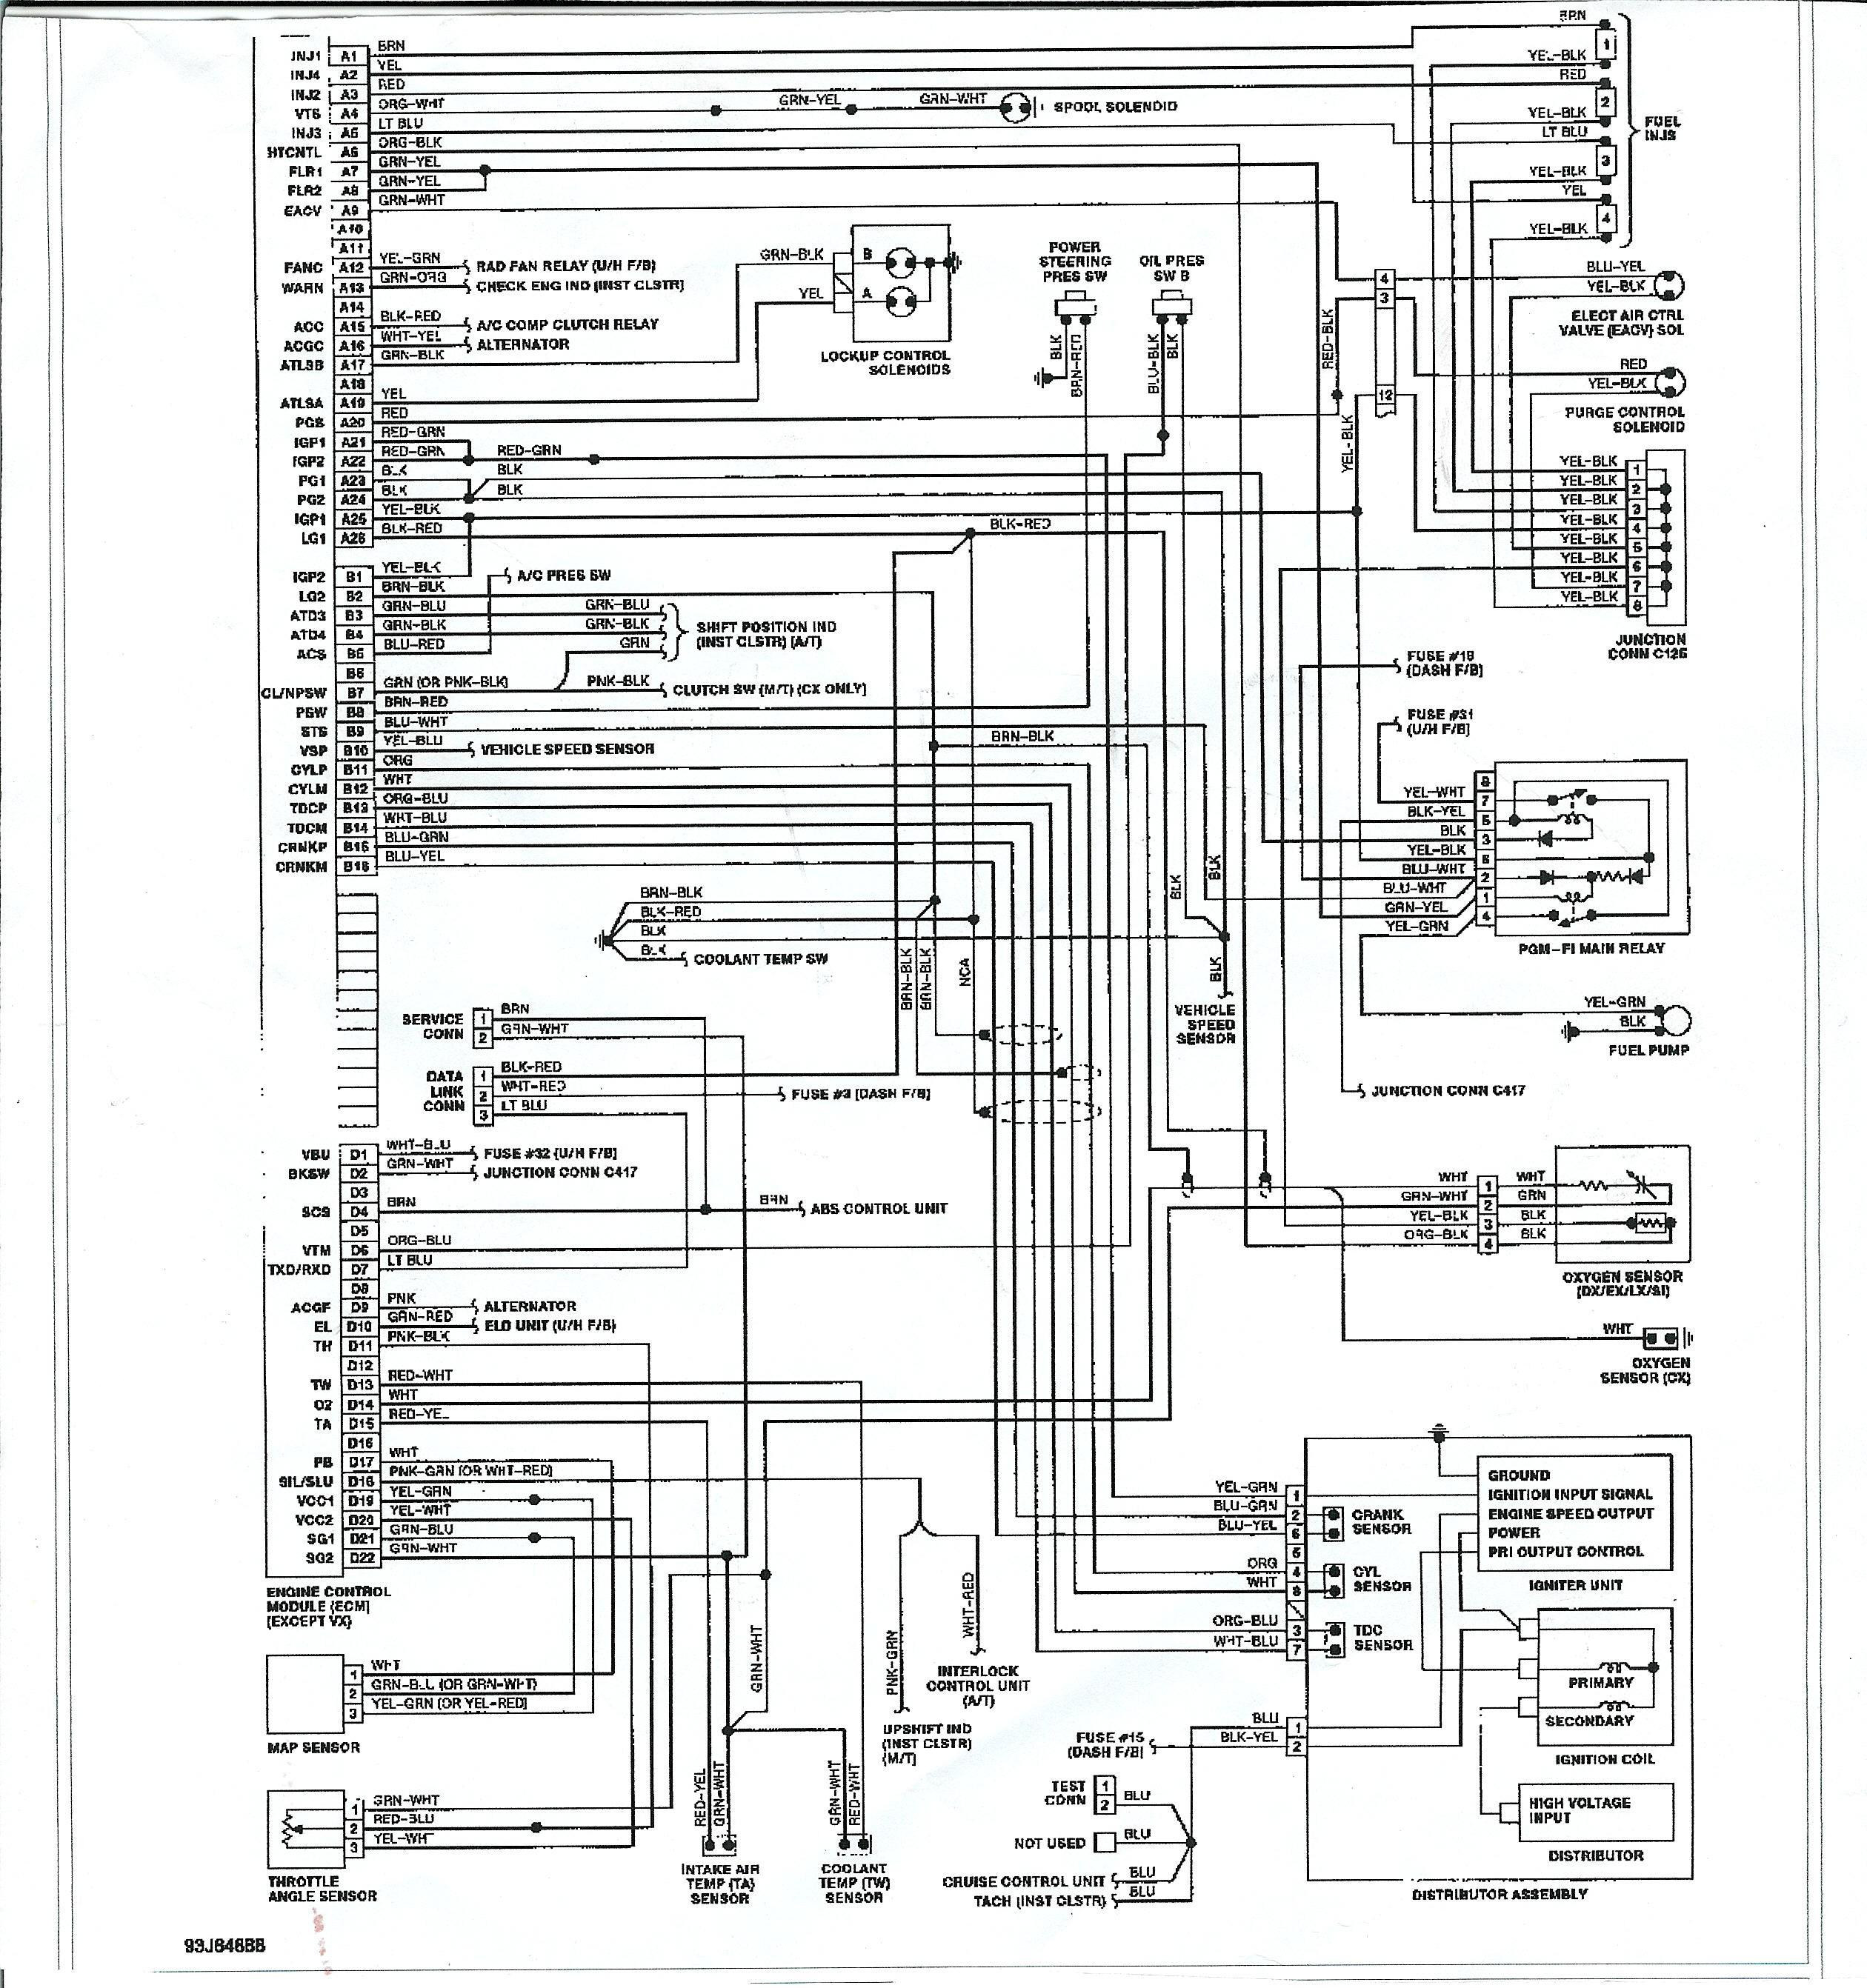 Diagram Of Transmission Vw Transporter Wiring Diagram 95 Honda Civic Transmission Diagram Of Diagram Of Transmission